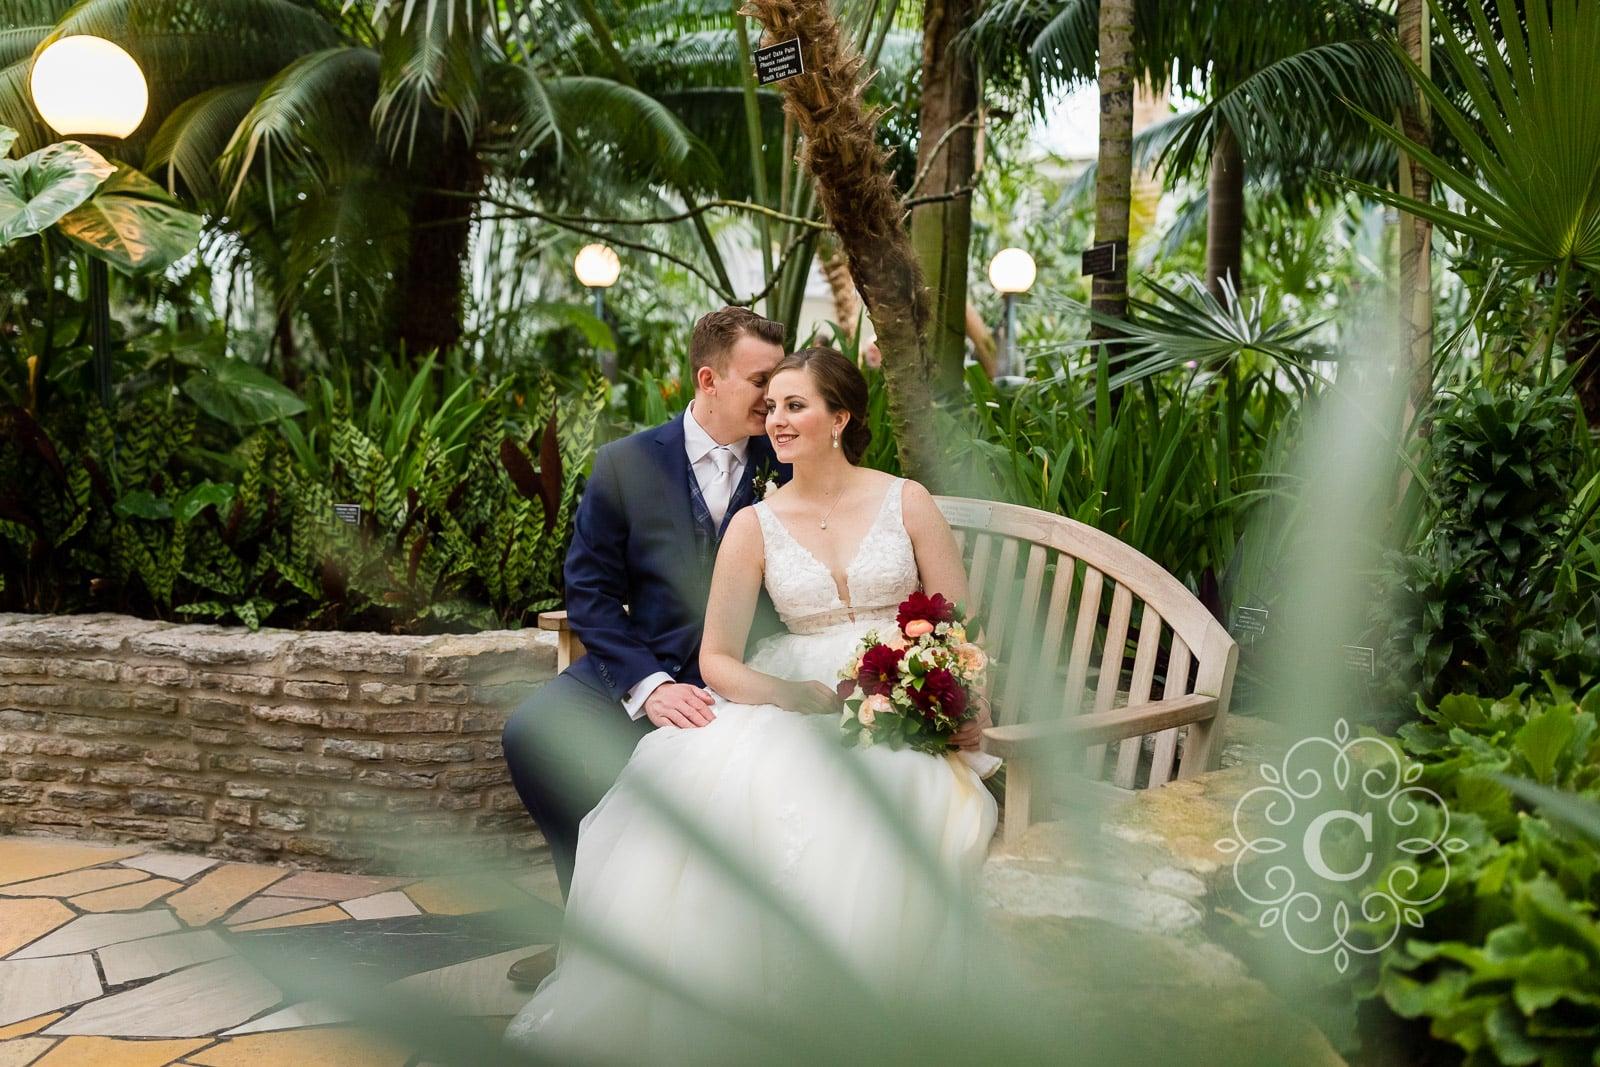 Marjorie McNeely Como Park Conservatory Wedding Photo